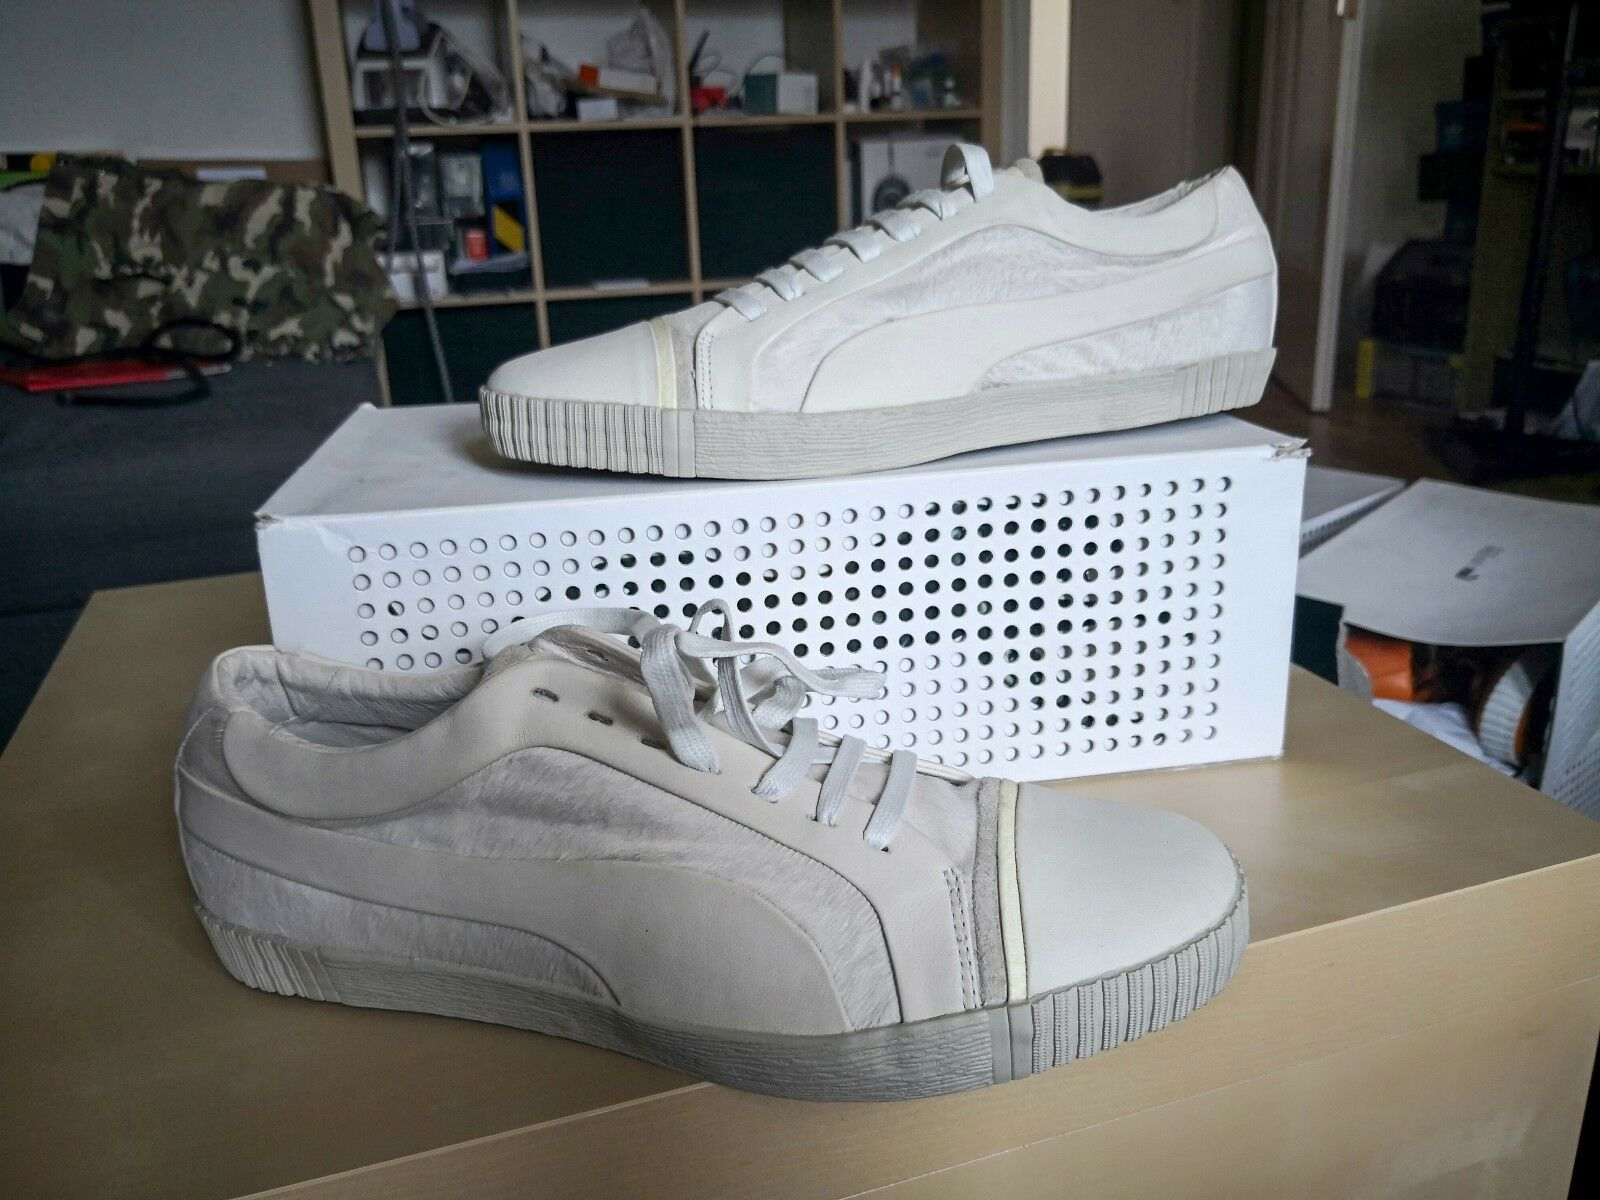 Puma Alexander McQueen Sneaker MCQ AMQ Promo Sample 44 Neu Rare Top Gr. 44 Sample 6bd3a0